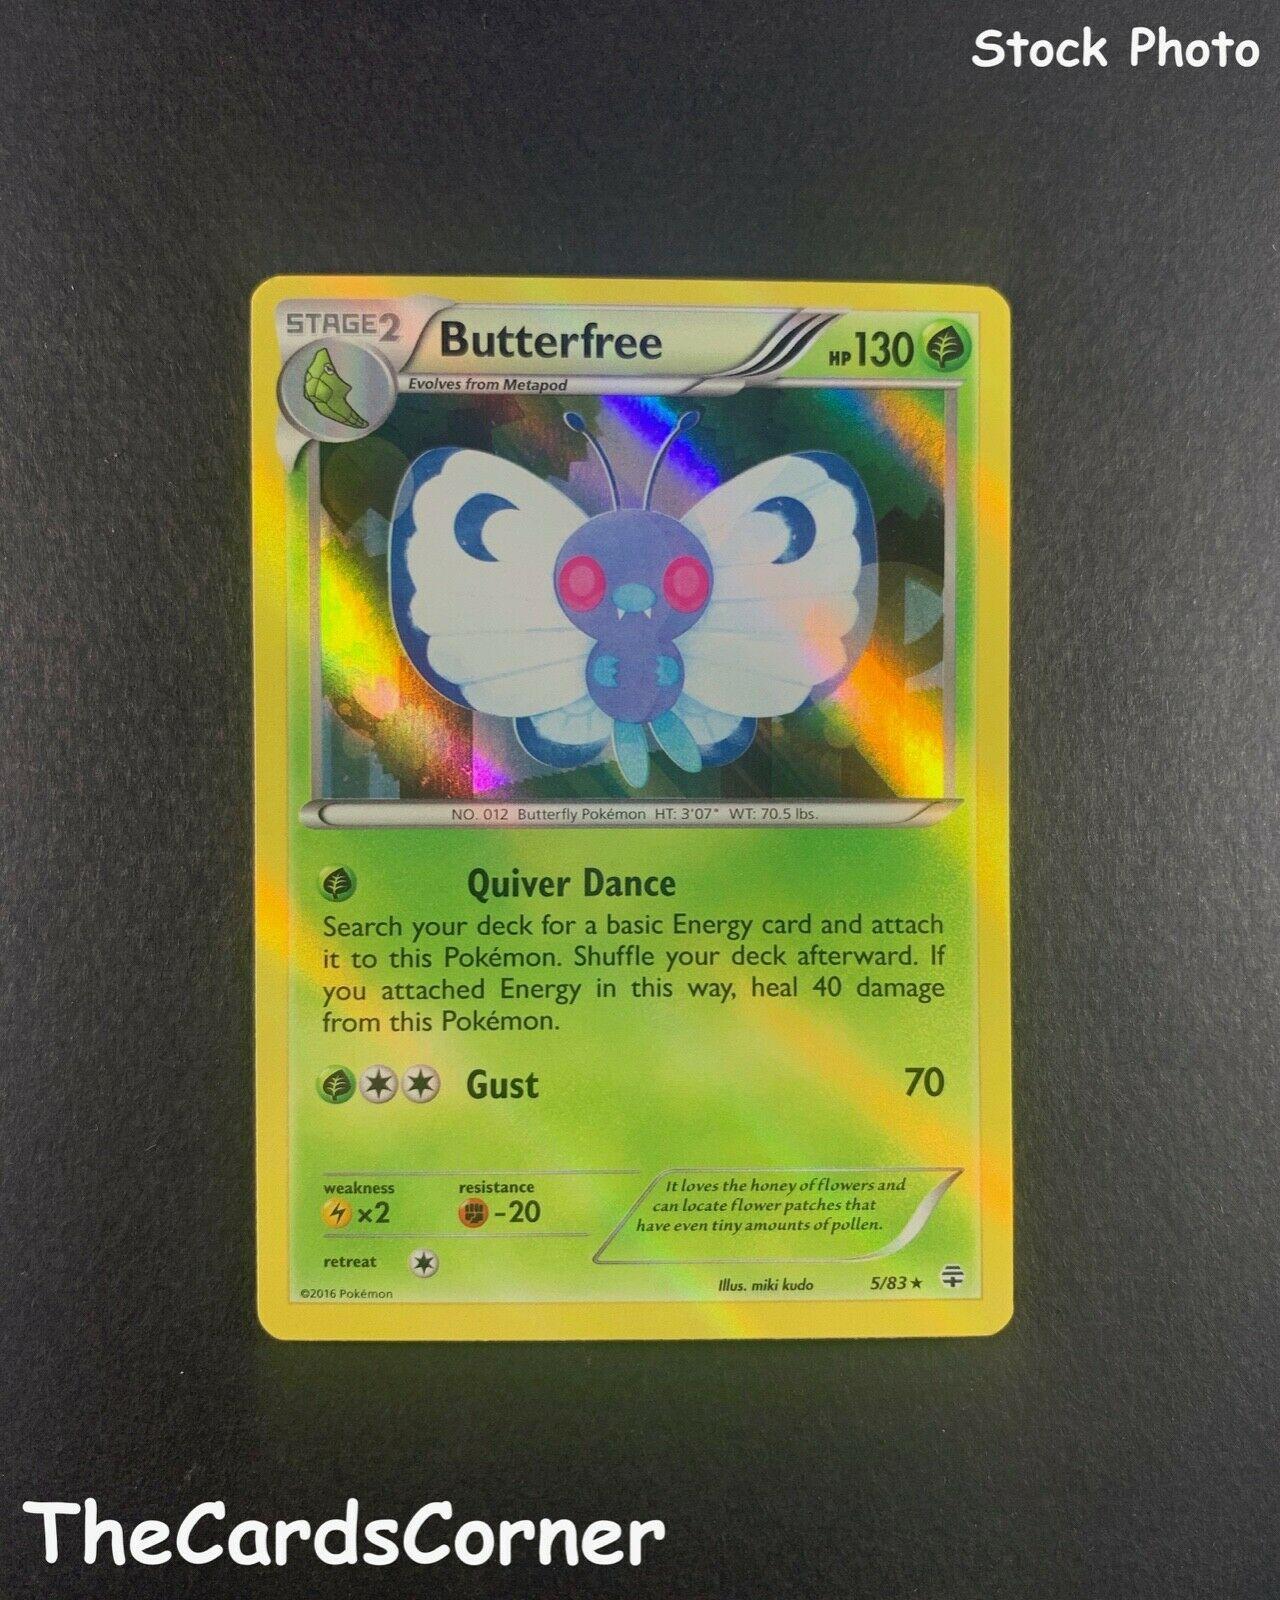 Generations 5//83 Butterfree Reverse Holo Mint Pokemon Card